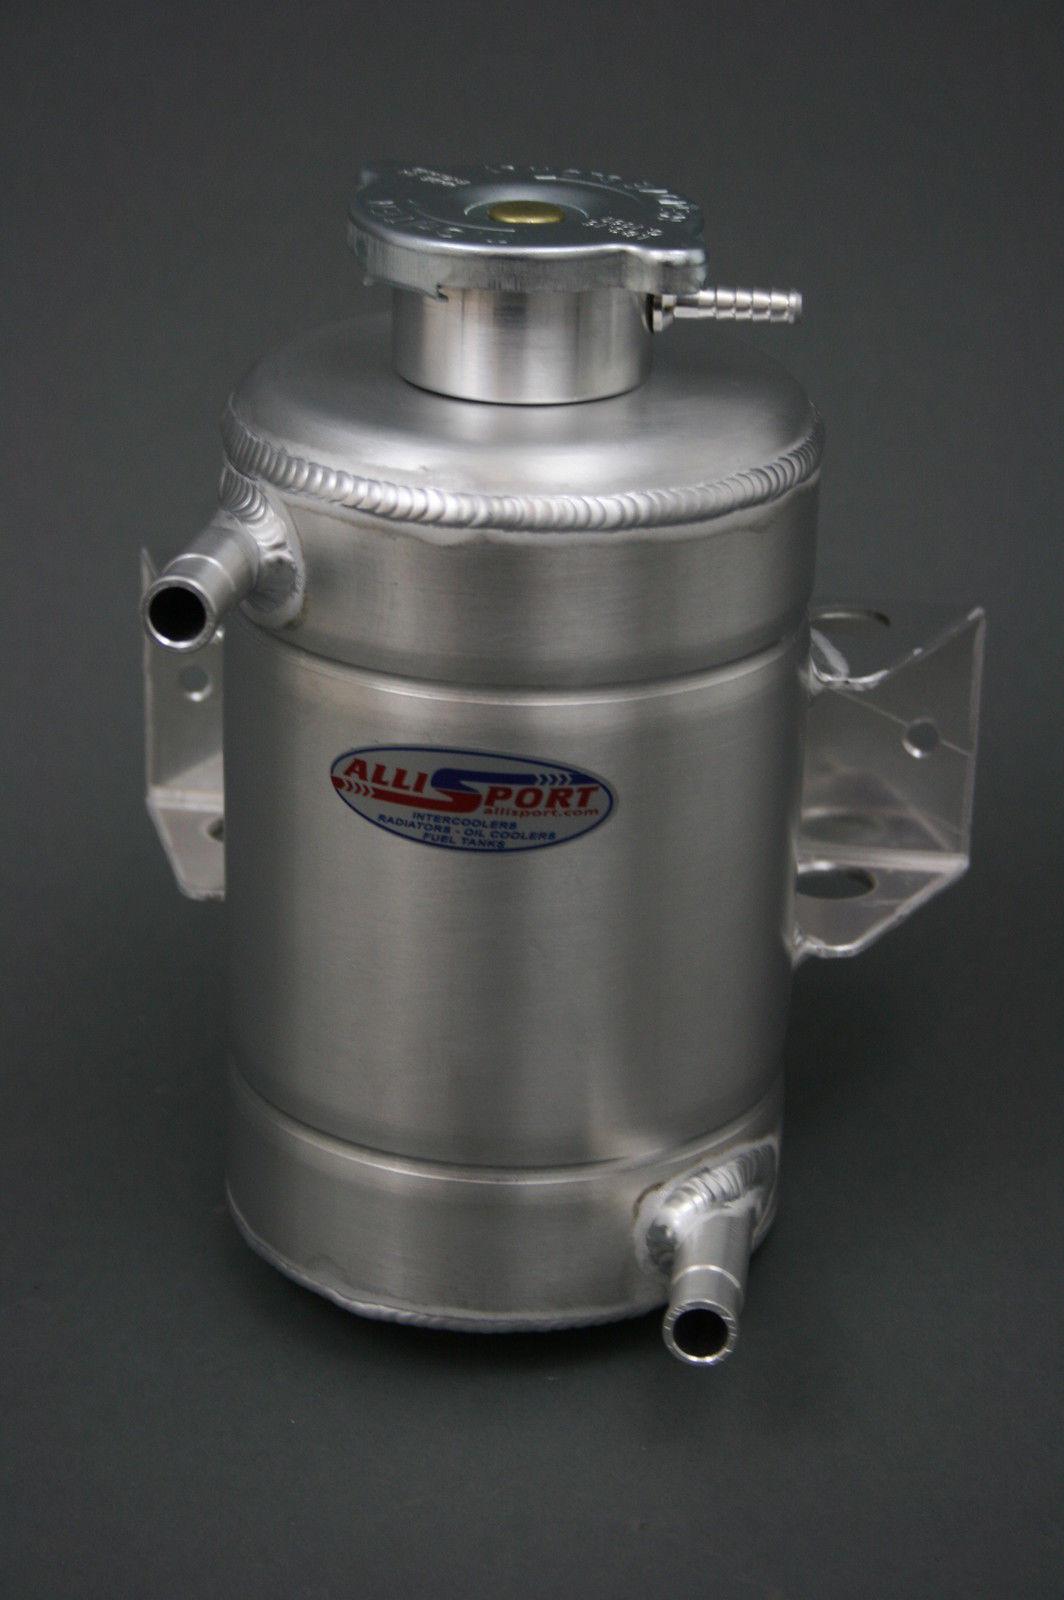 Universal header tank swirl pot - AlliSport